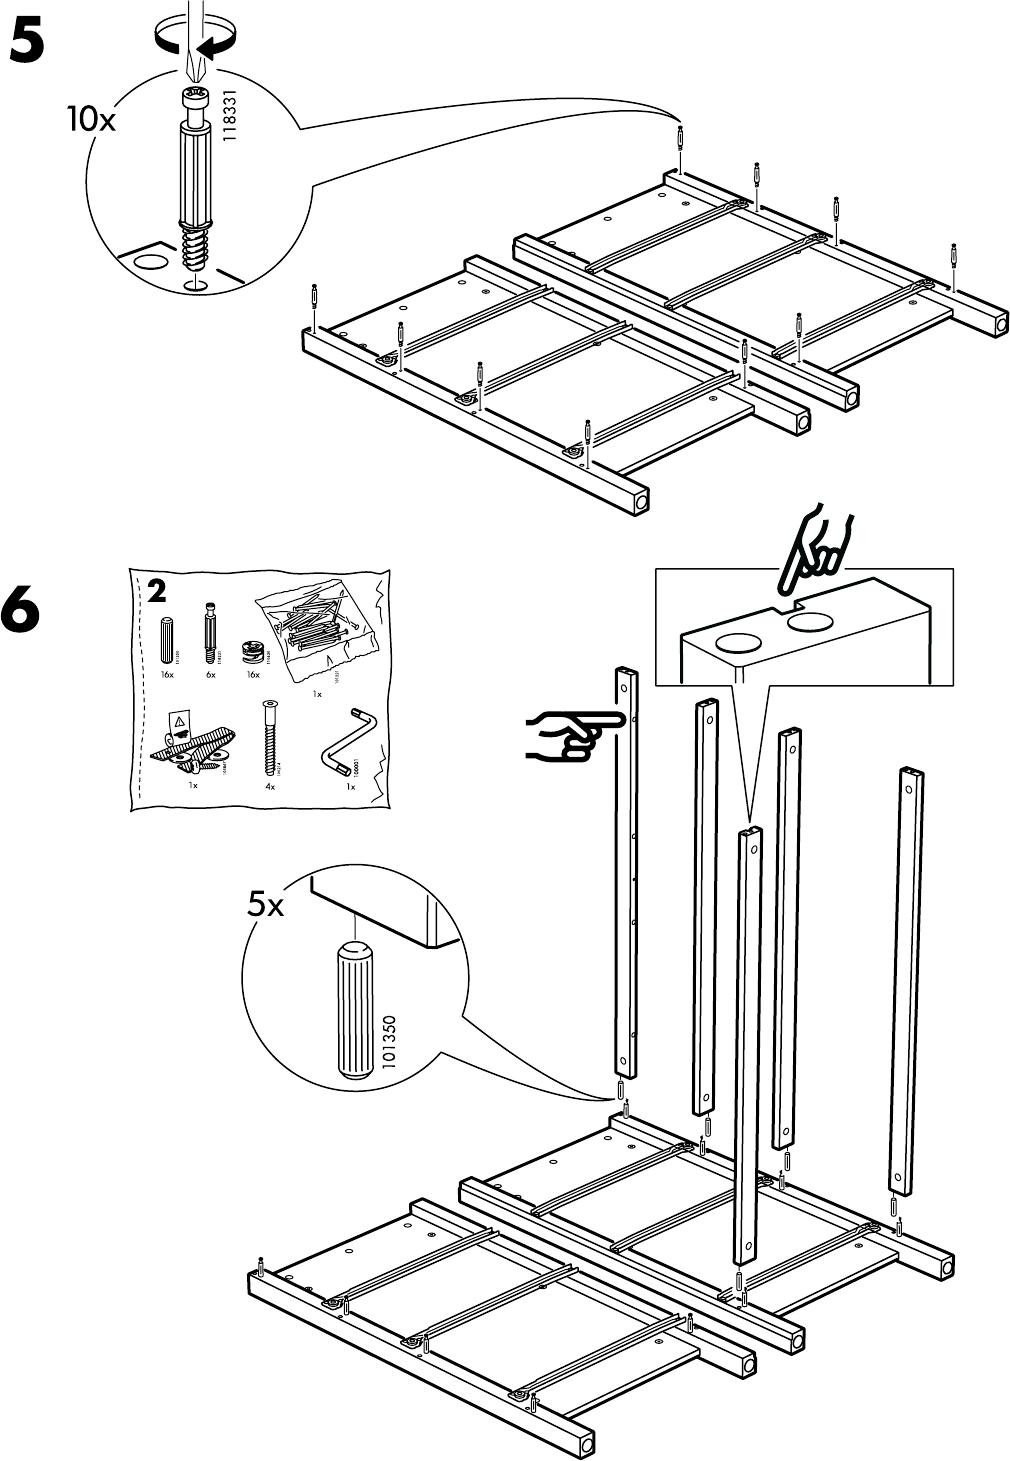 Hemnes Ladekast 3 Laden.Handleiding Ikea Hemnes Ladekast 3 Lades Pagina 7 Van 20